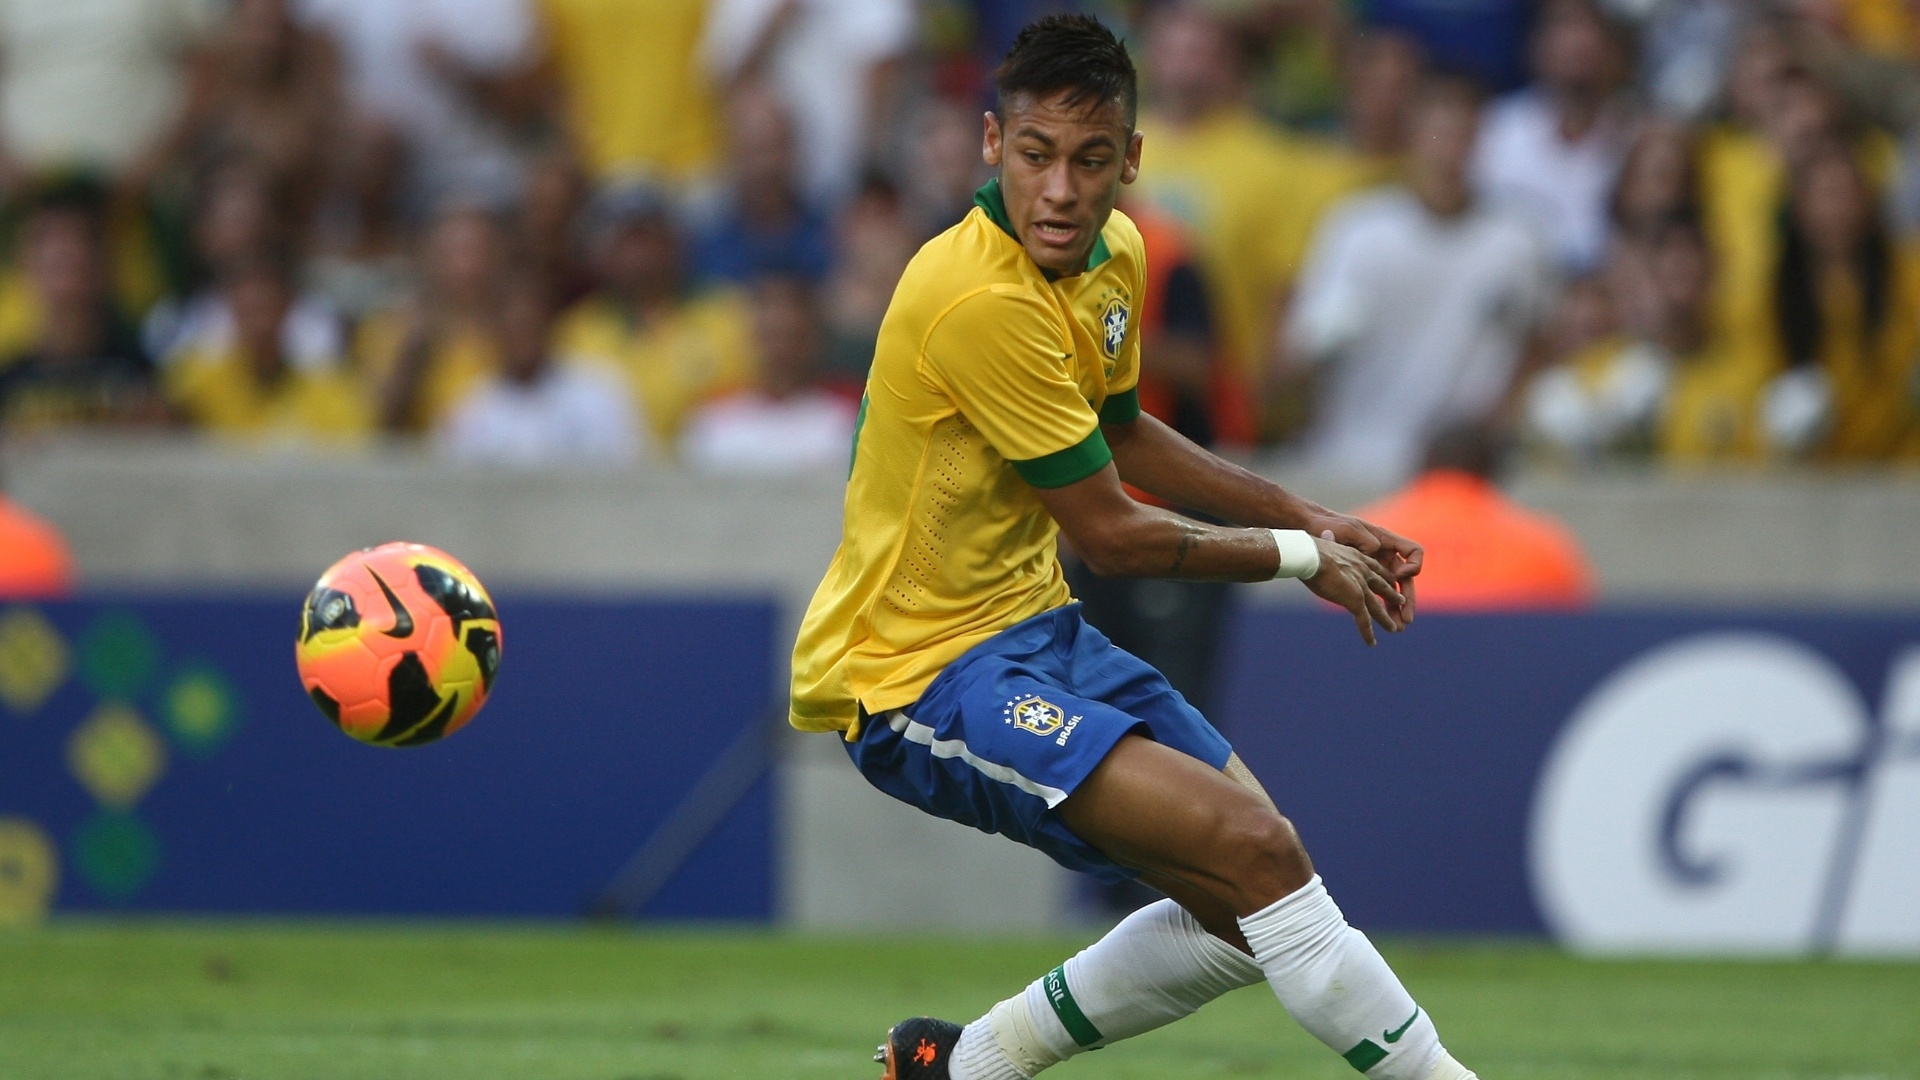 02.jun.2013 - Neymar observa a bola durante amistoso entre Brasil e Inglaterra no Maracanã